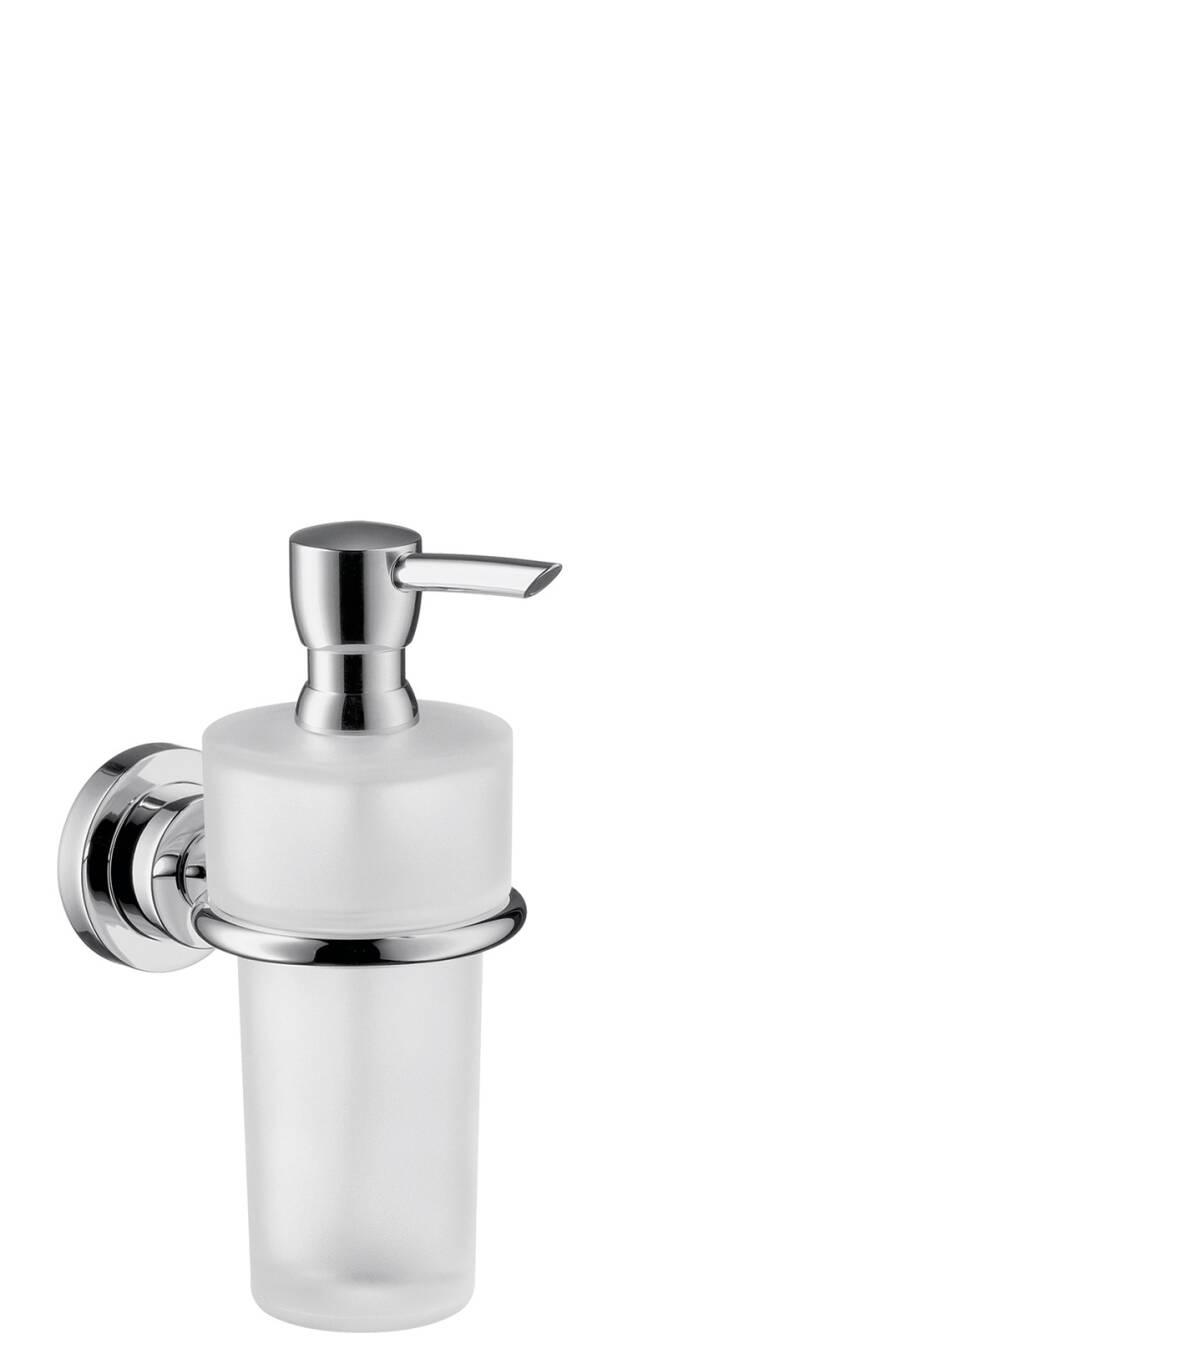 Dosificador de jabón, cromo, 41719000